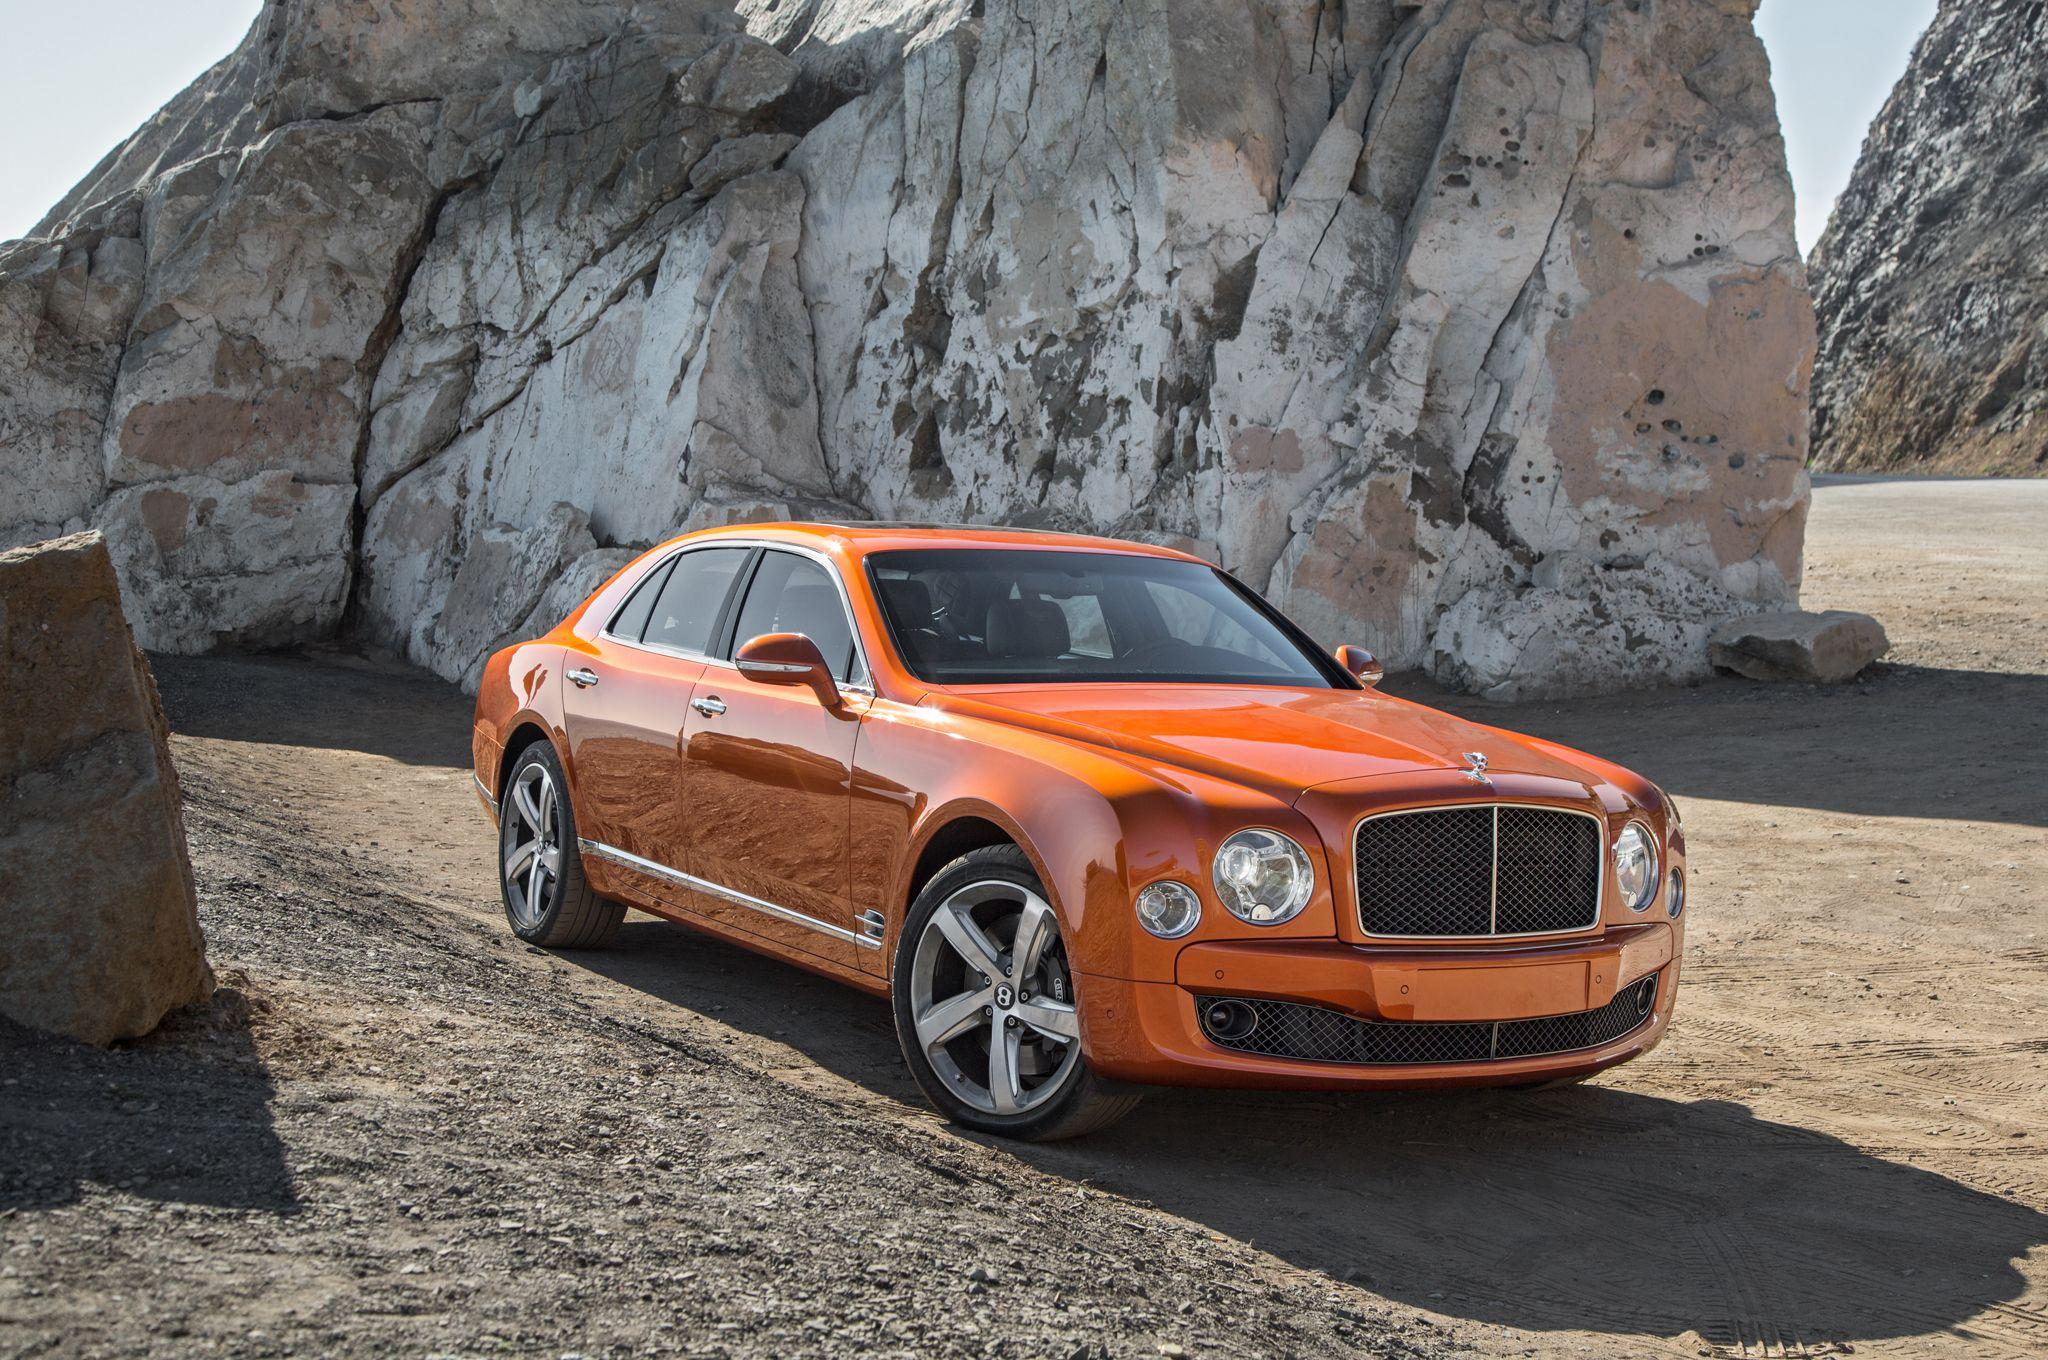 Bentley Mulsanne | Luxury Car Obsession | Pinterest | Bentley ...